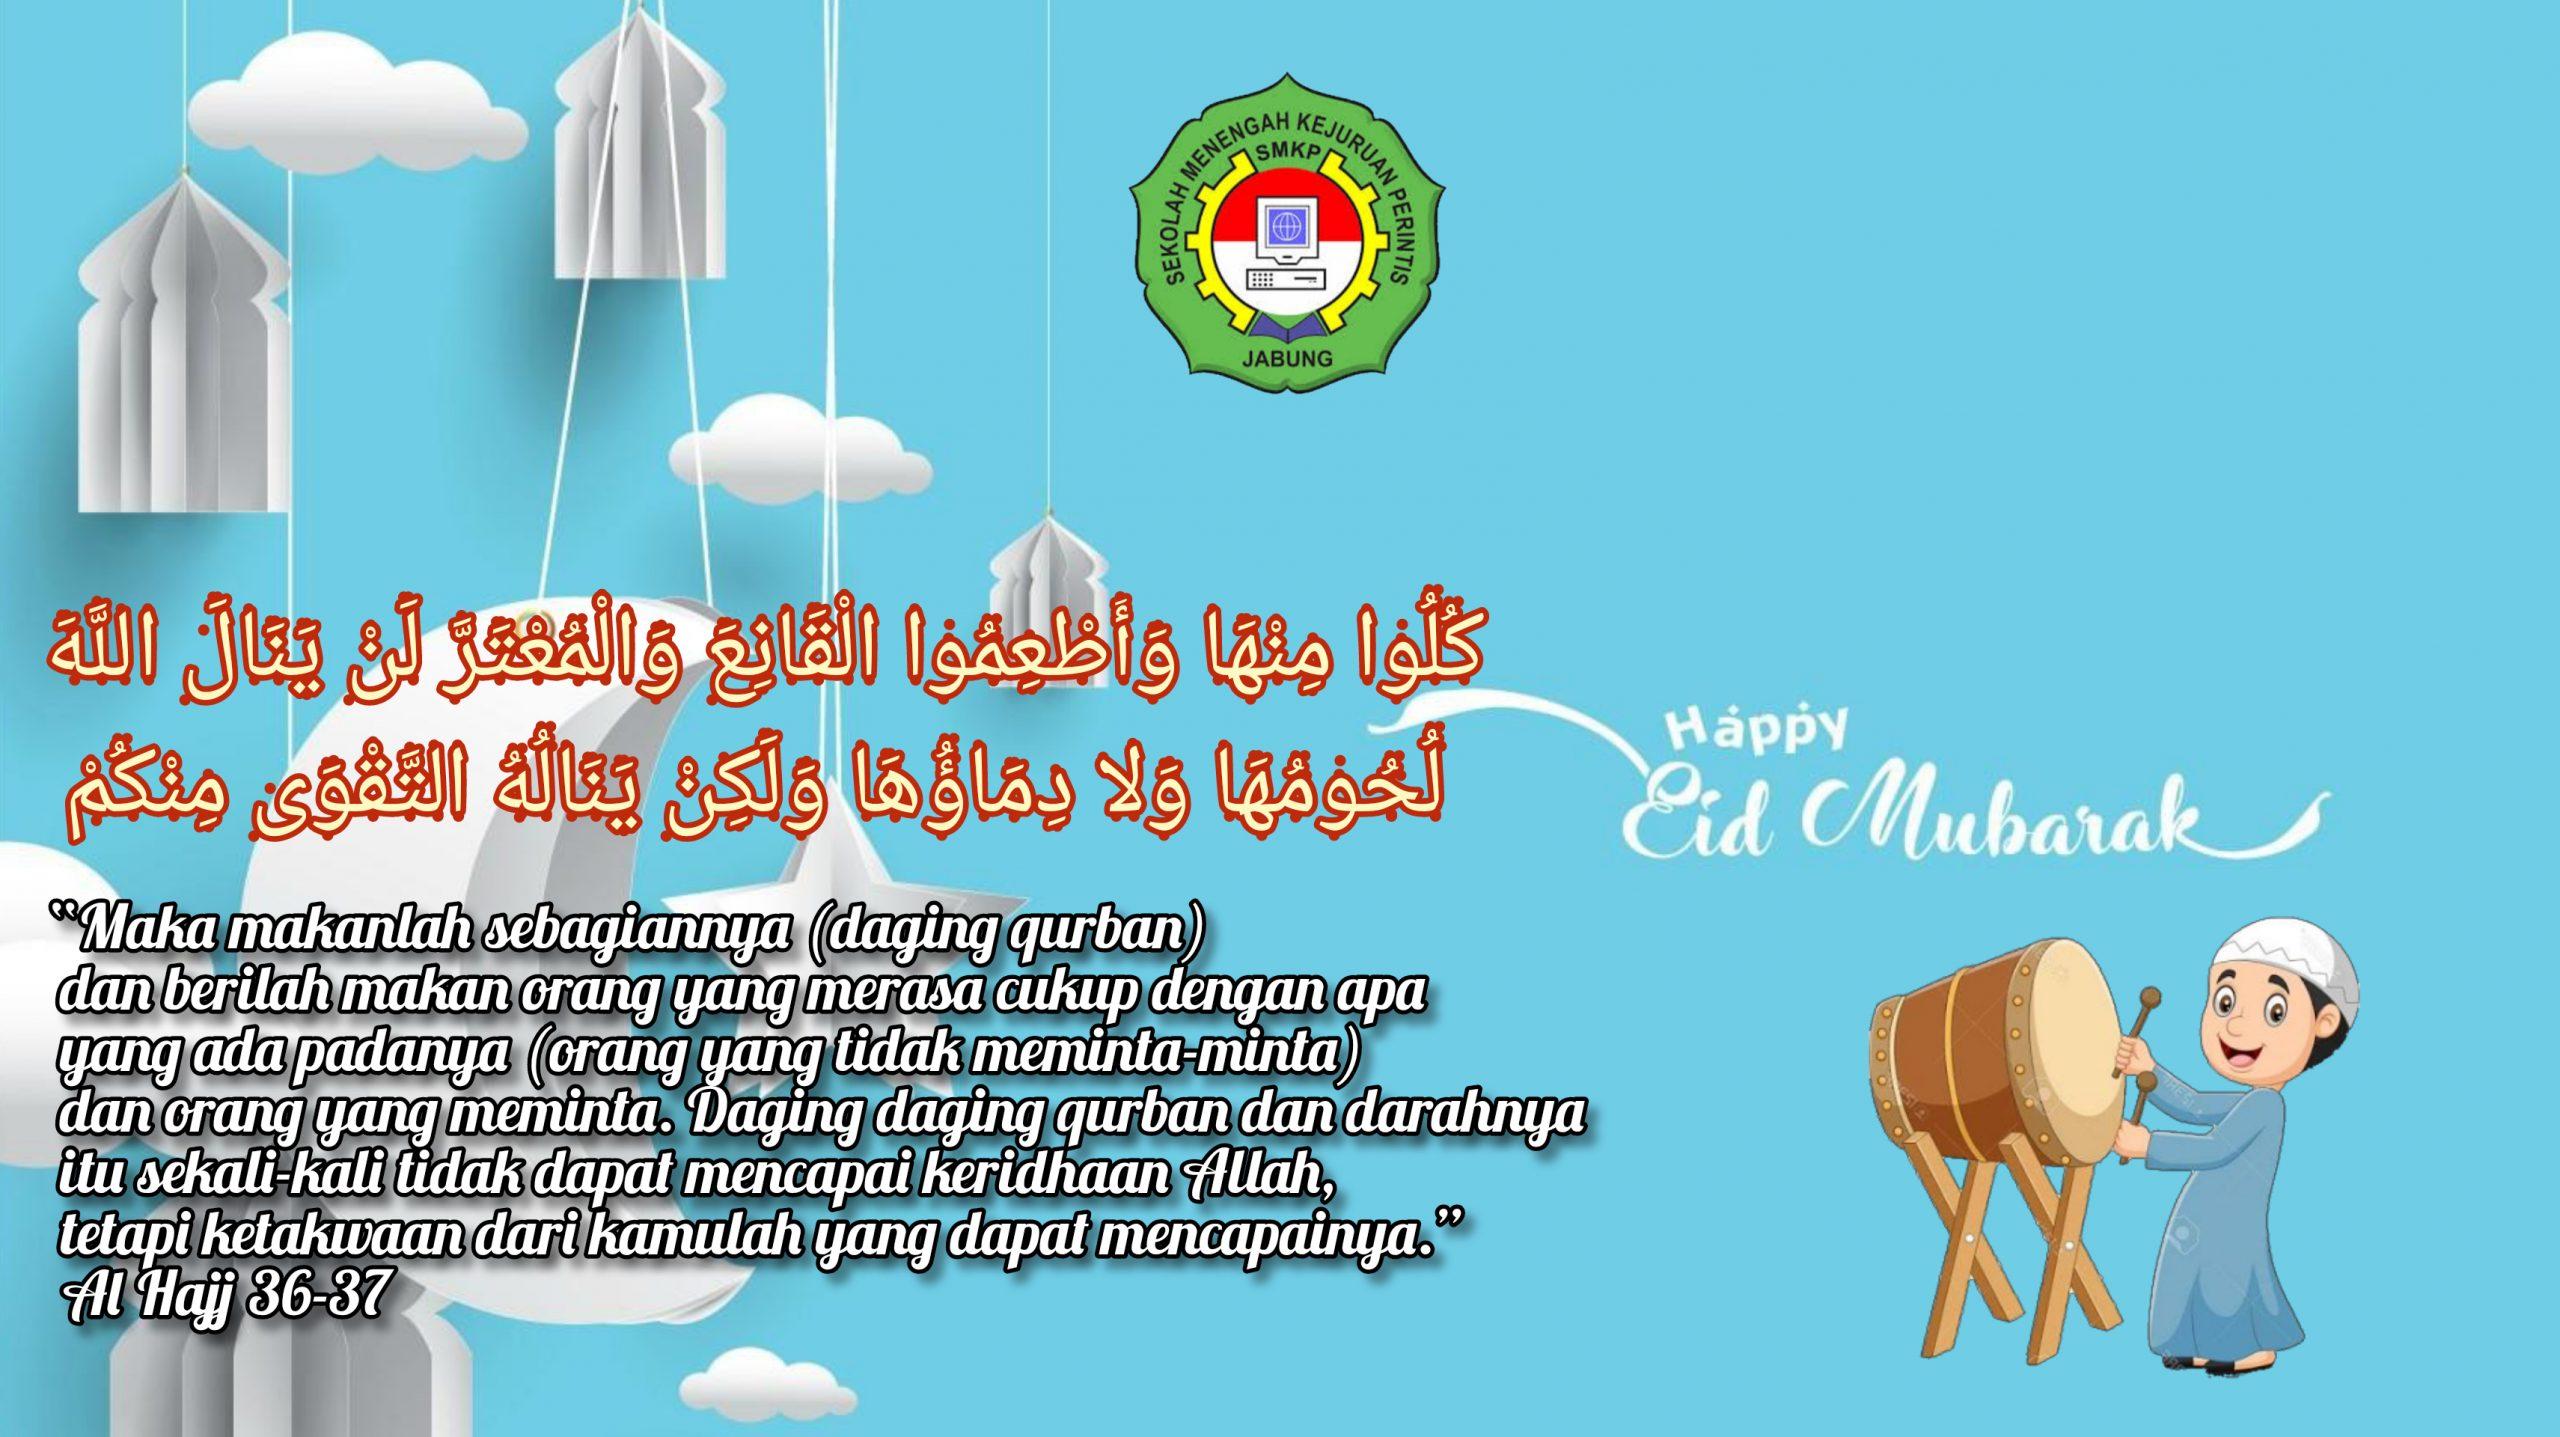 Hari Raya Idul Adha 1441 Hijriyah